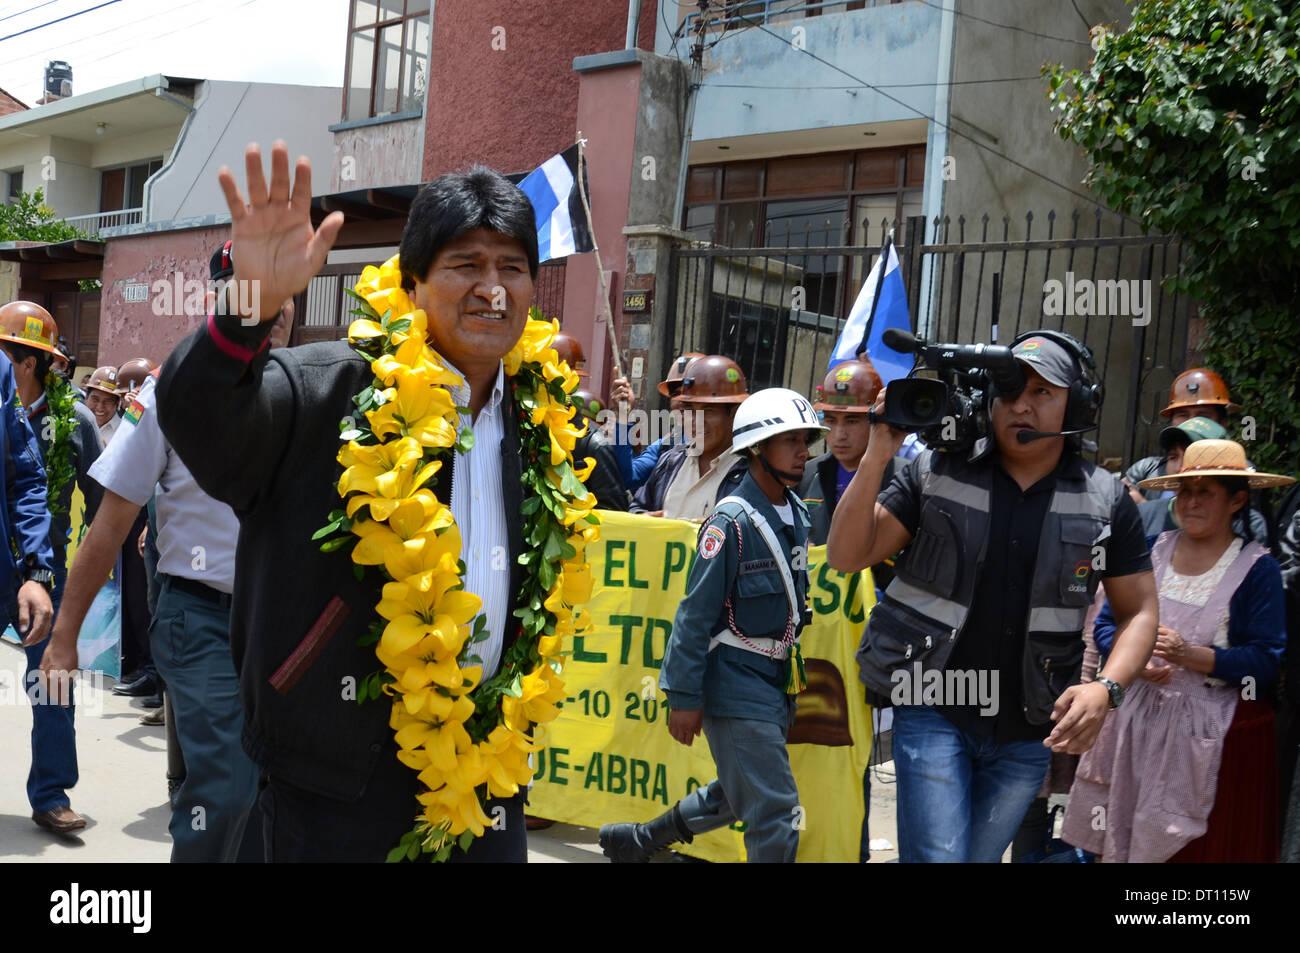 Cochabamba, Bolivia. 5th Feb, 2014. Bolivia's President Evo Morales attends the handover ceremony of the new headquarters of the Cochabamba Federation of Mining Cooperatives in Cochabamba, Bolivia, on Feb. 5, 2014. Credit:  R. Zaconeta/ABI/Xinhua/Alamy Live News - Stock Image